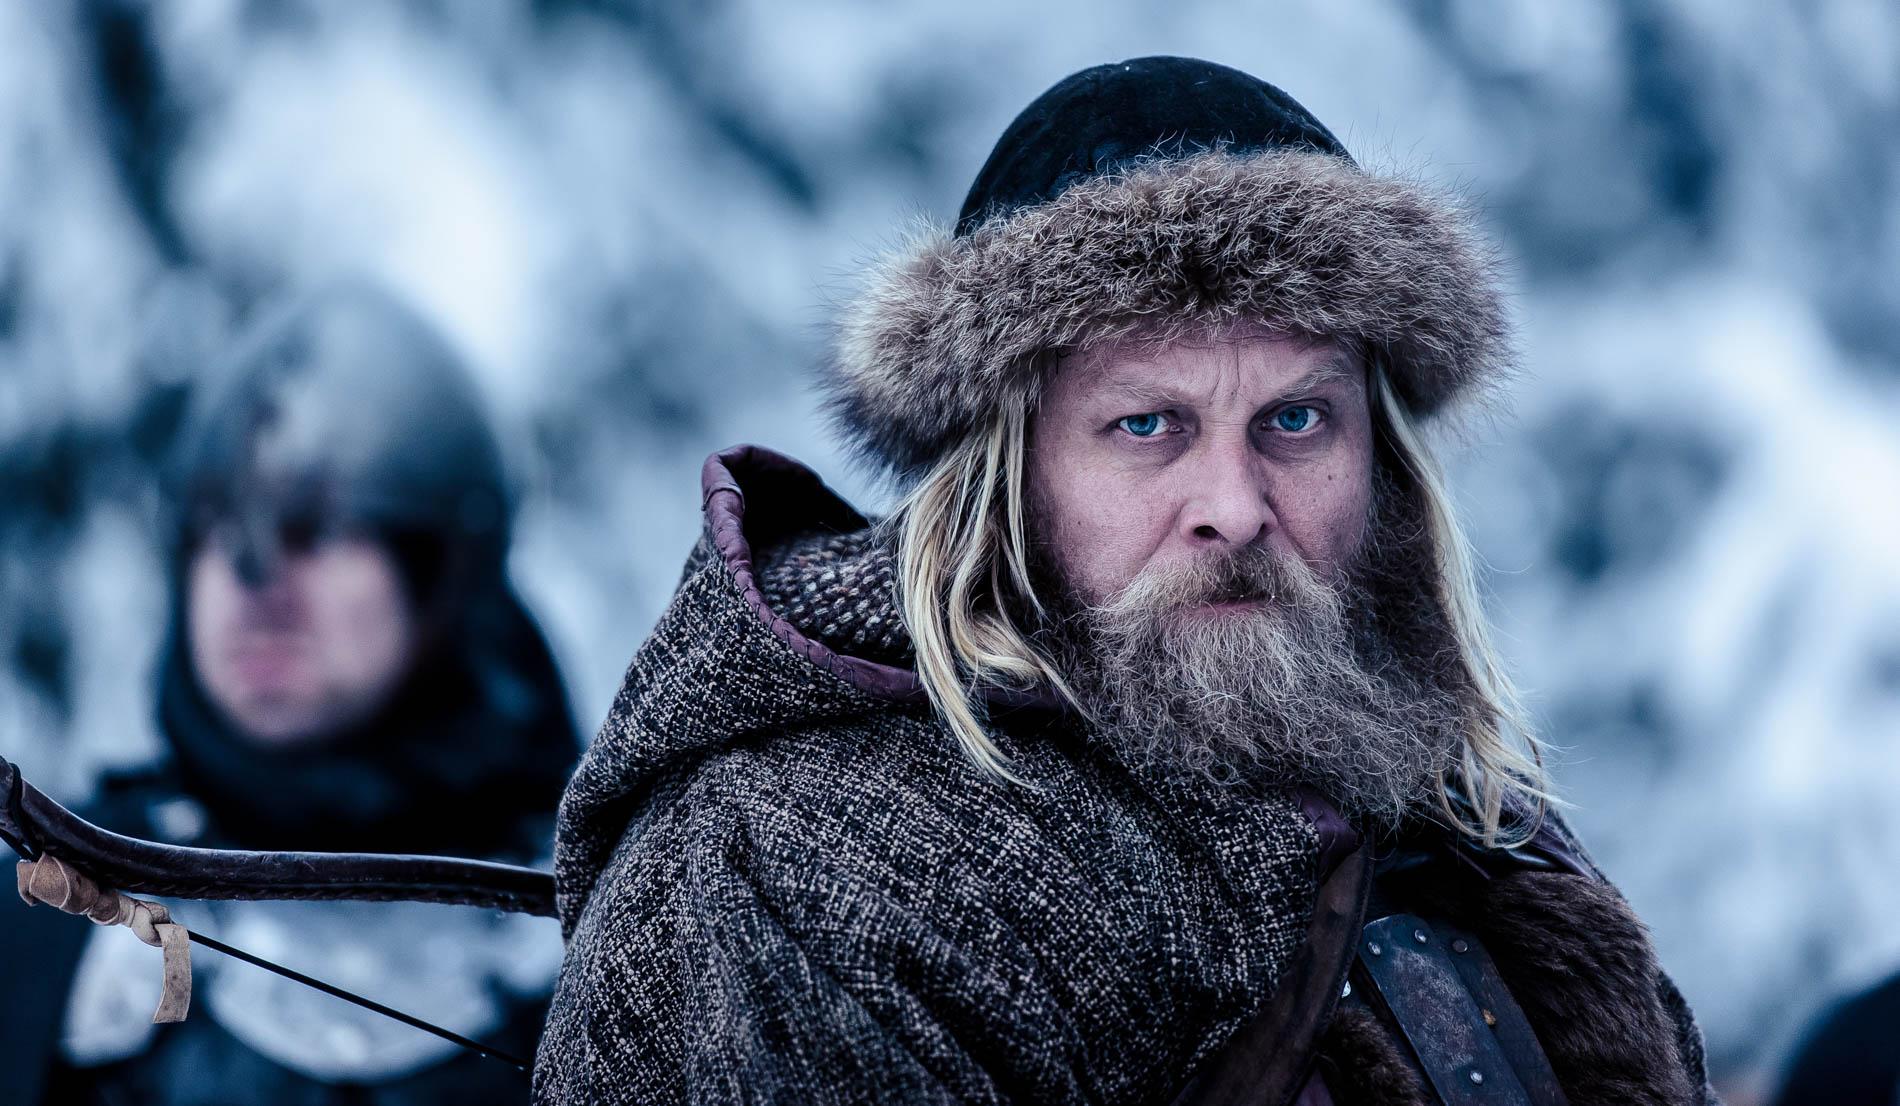 Arda, Birkebeinerne, Film Set, Film Still, Lillehammer, Norway, On Set, Production Still, The Last King, The World